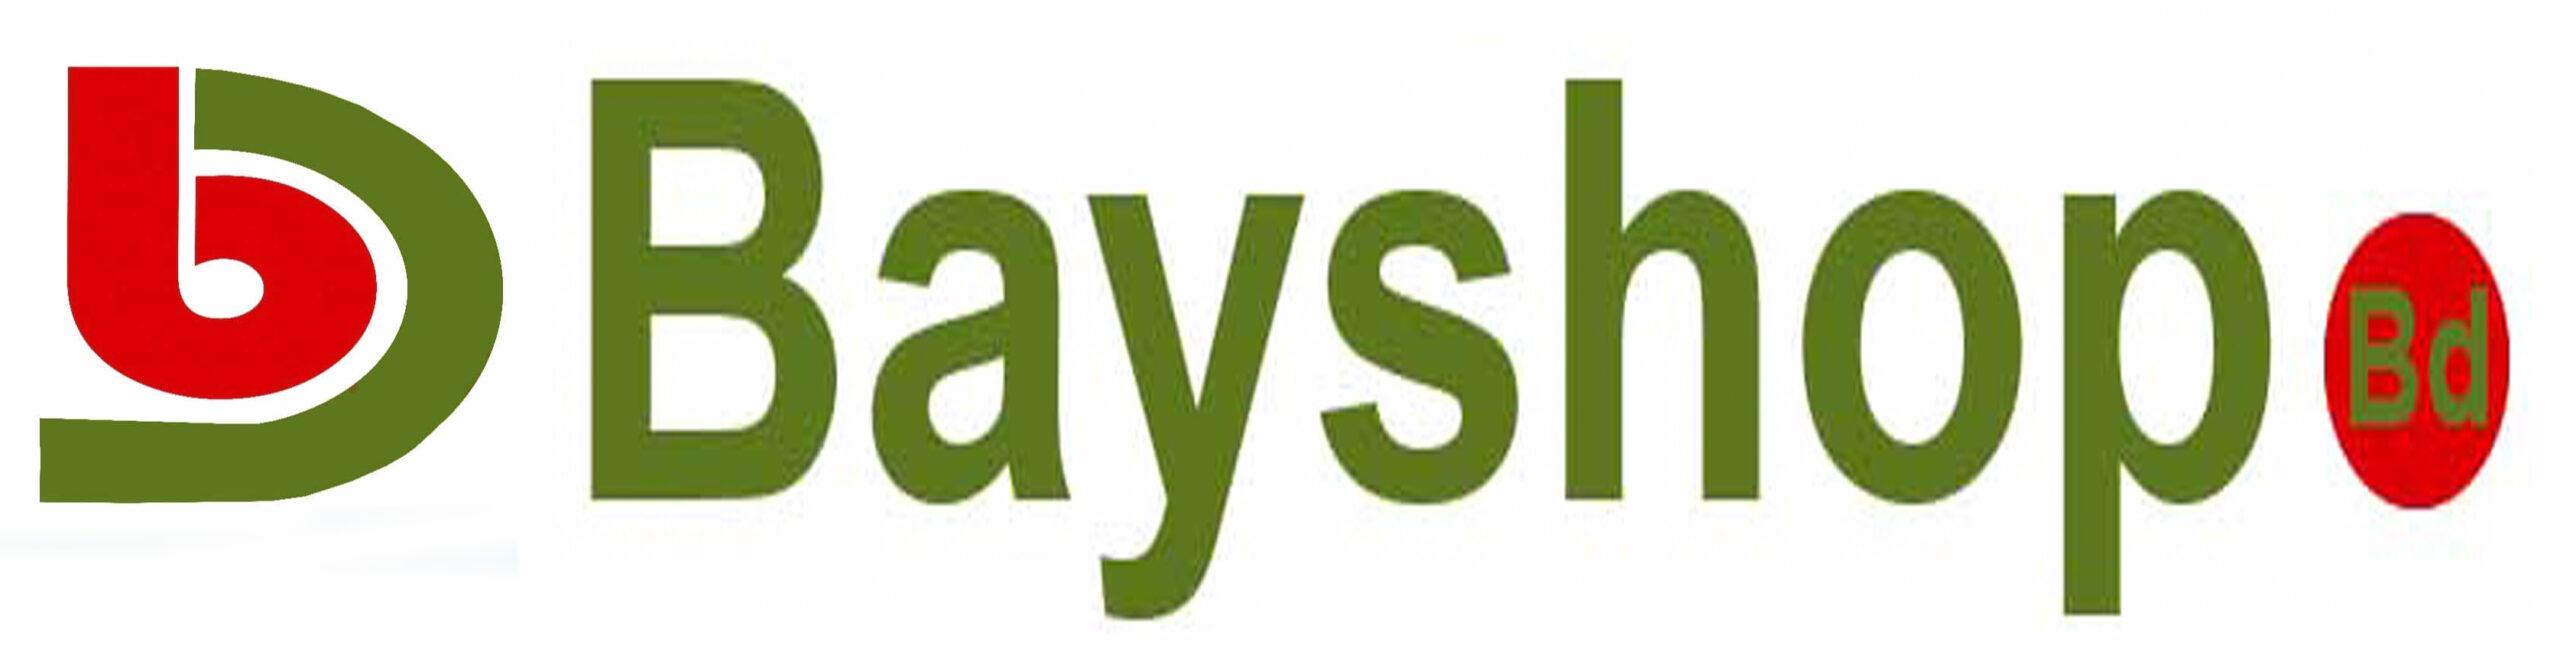 Bayshop Bd